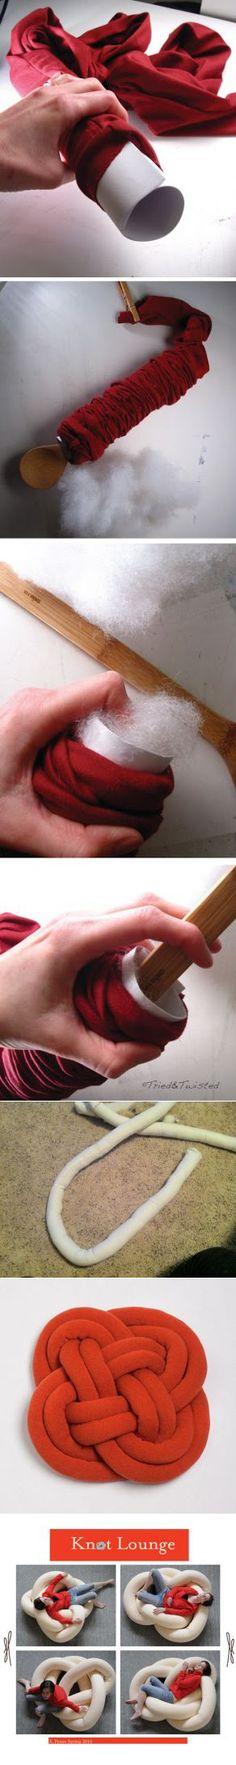 Оригинальная подушка-узел: мастер-класс и идеи | Ladiesvenue